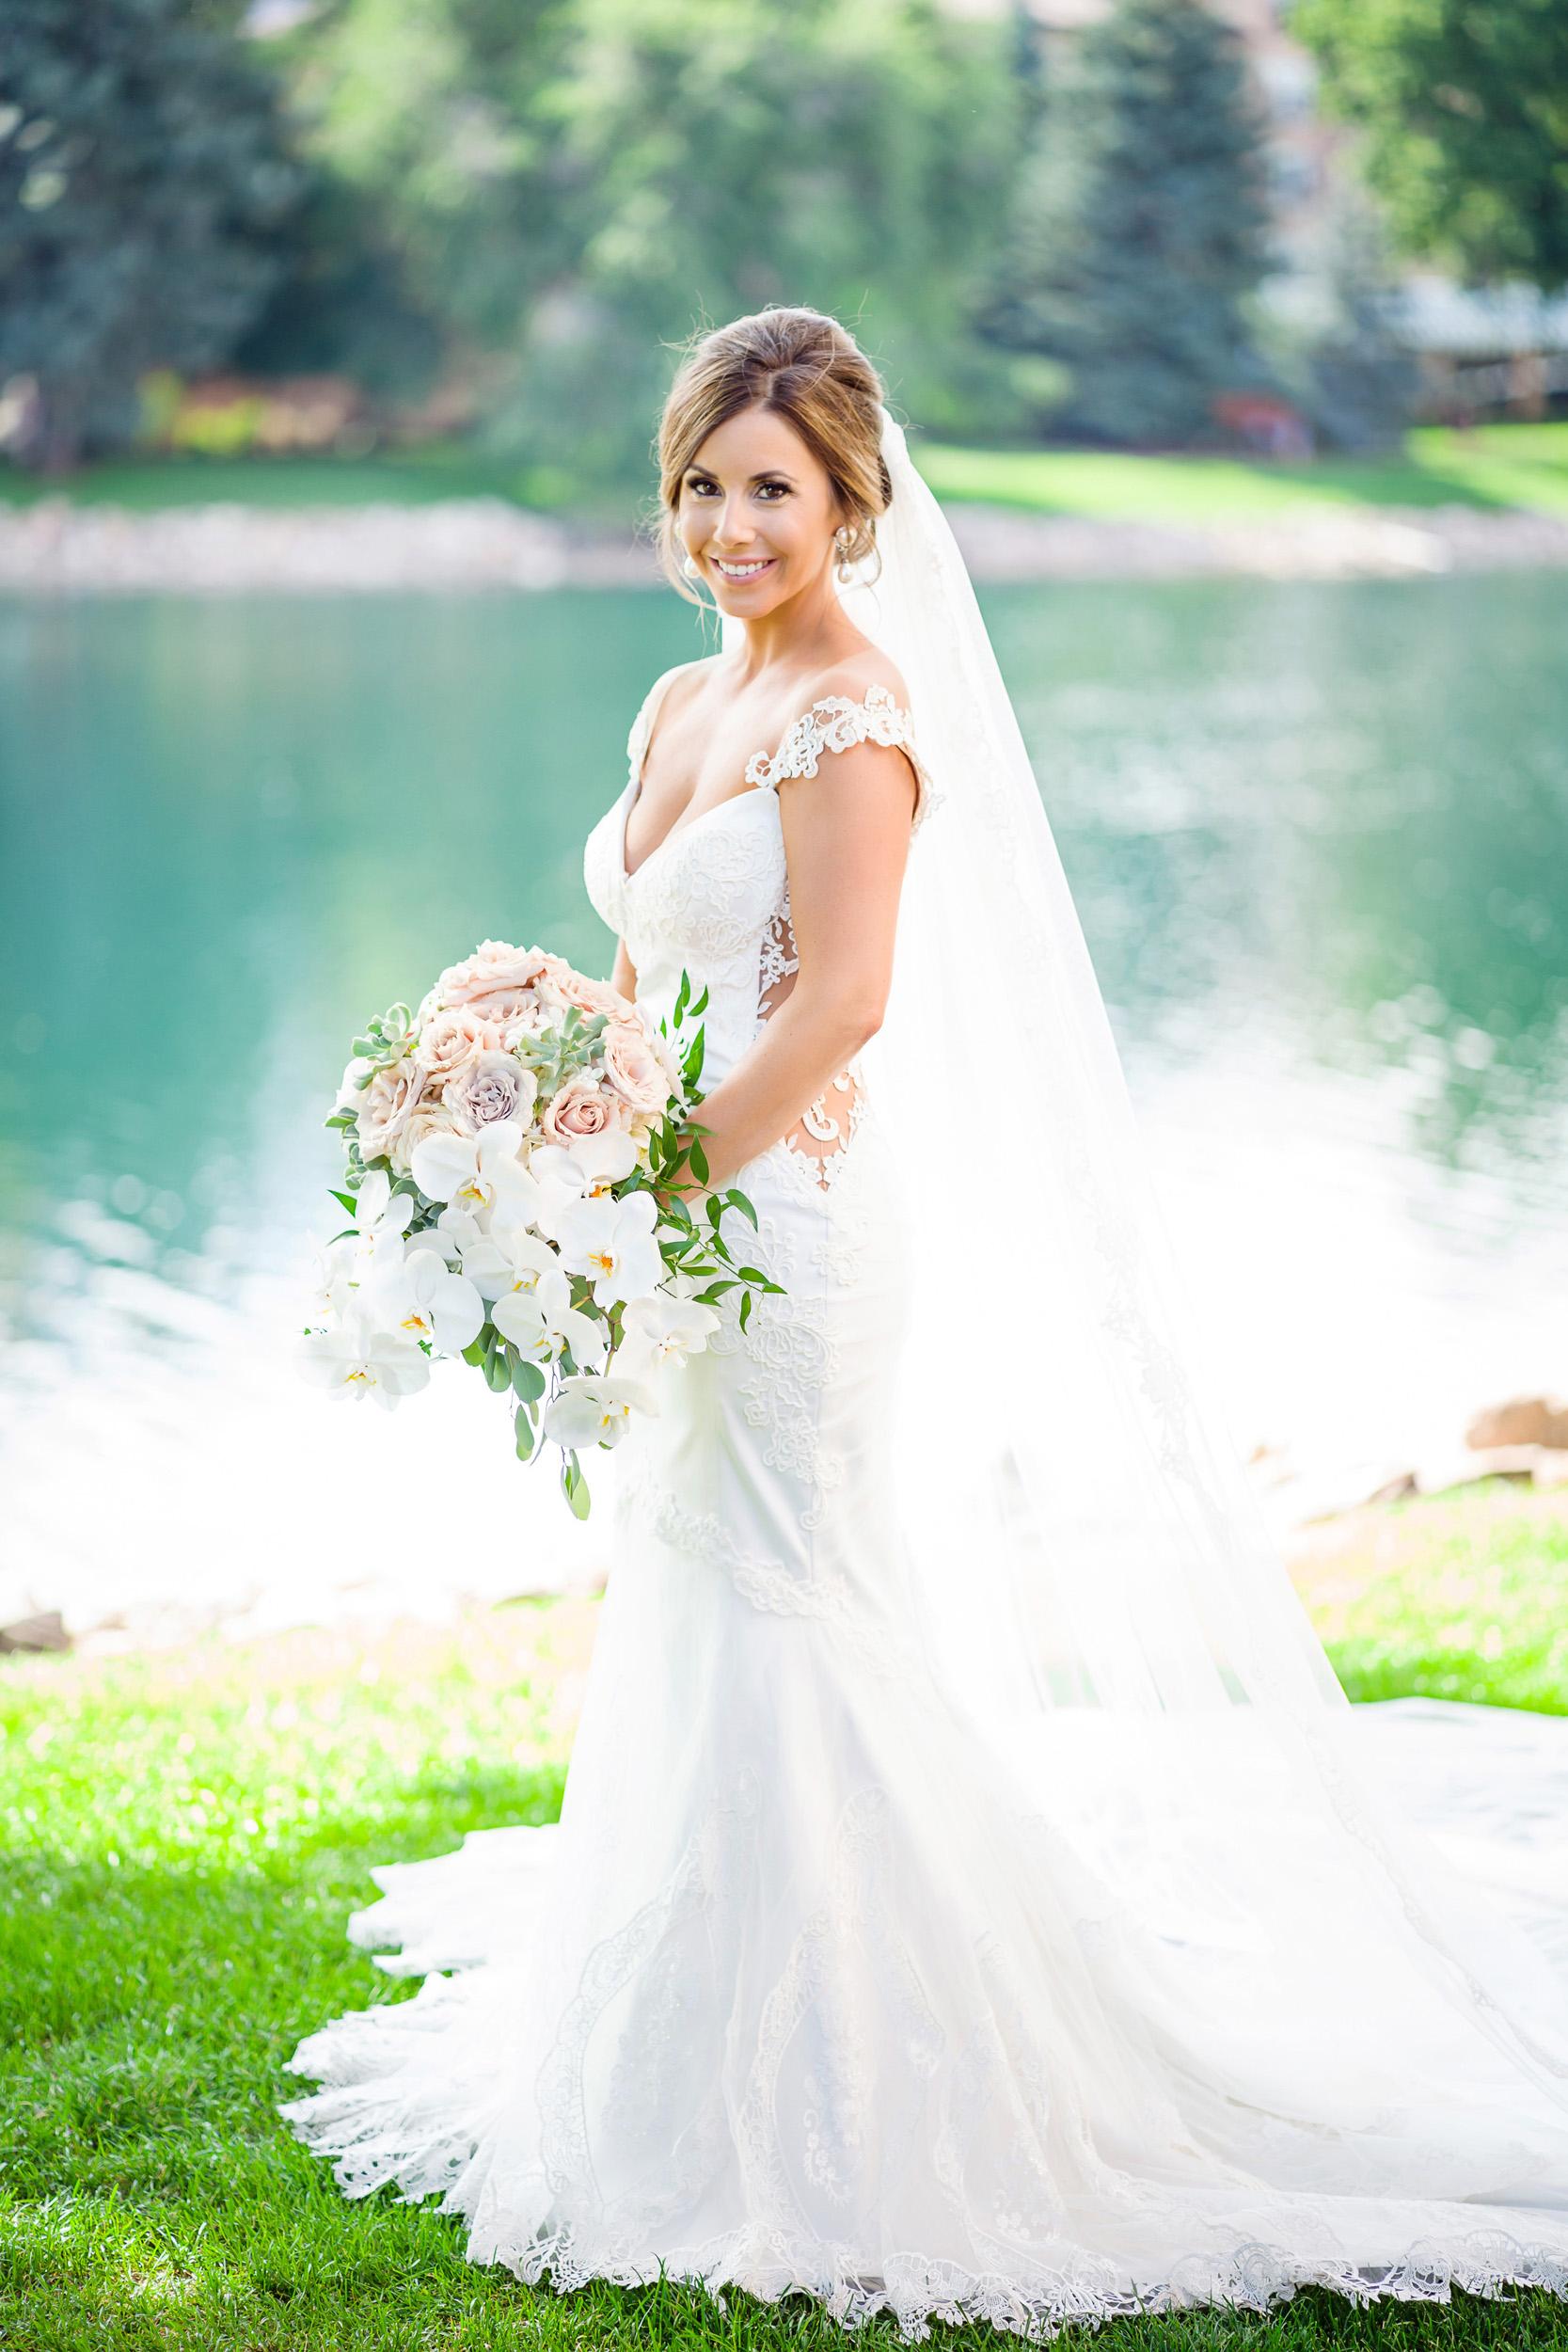 Broadmoor-Wedding-Photography-SS-004.jpg